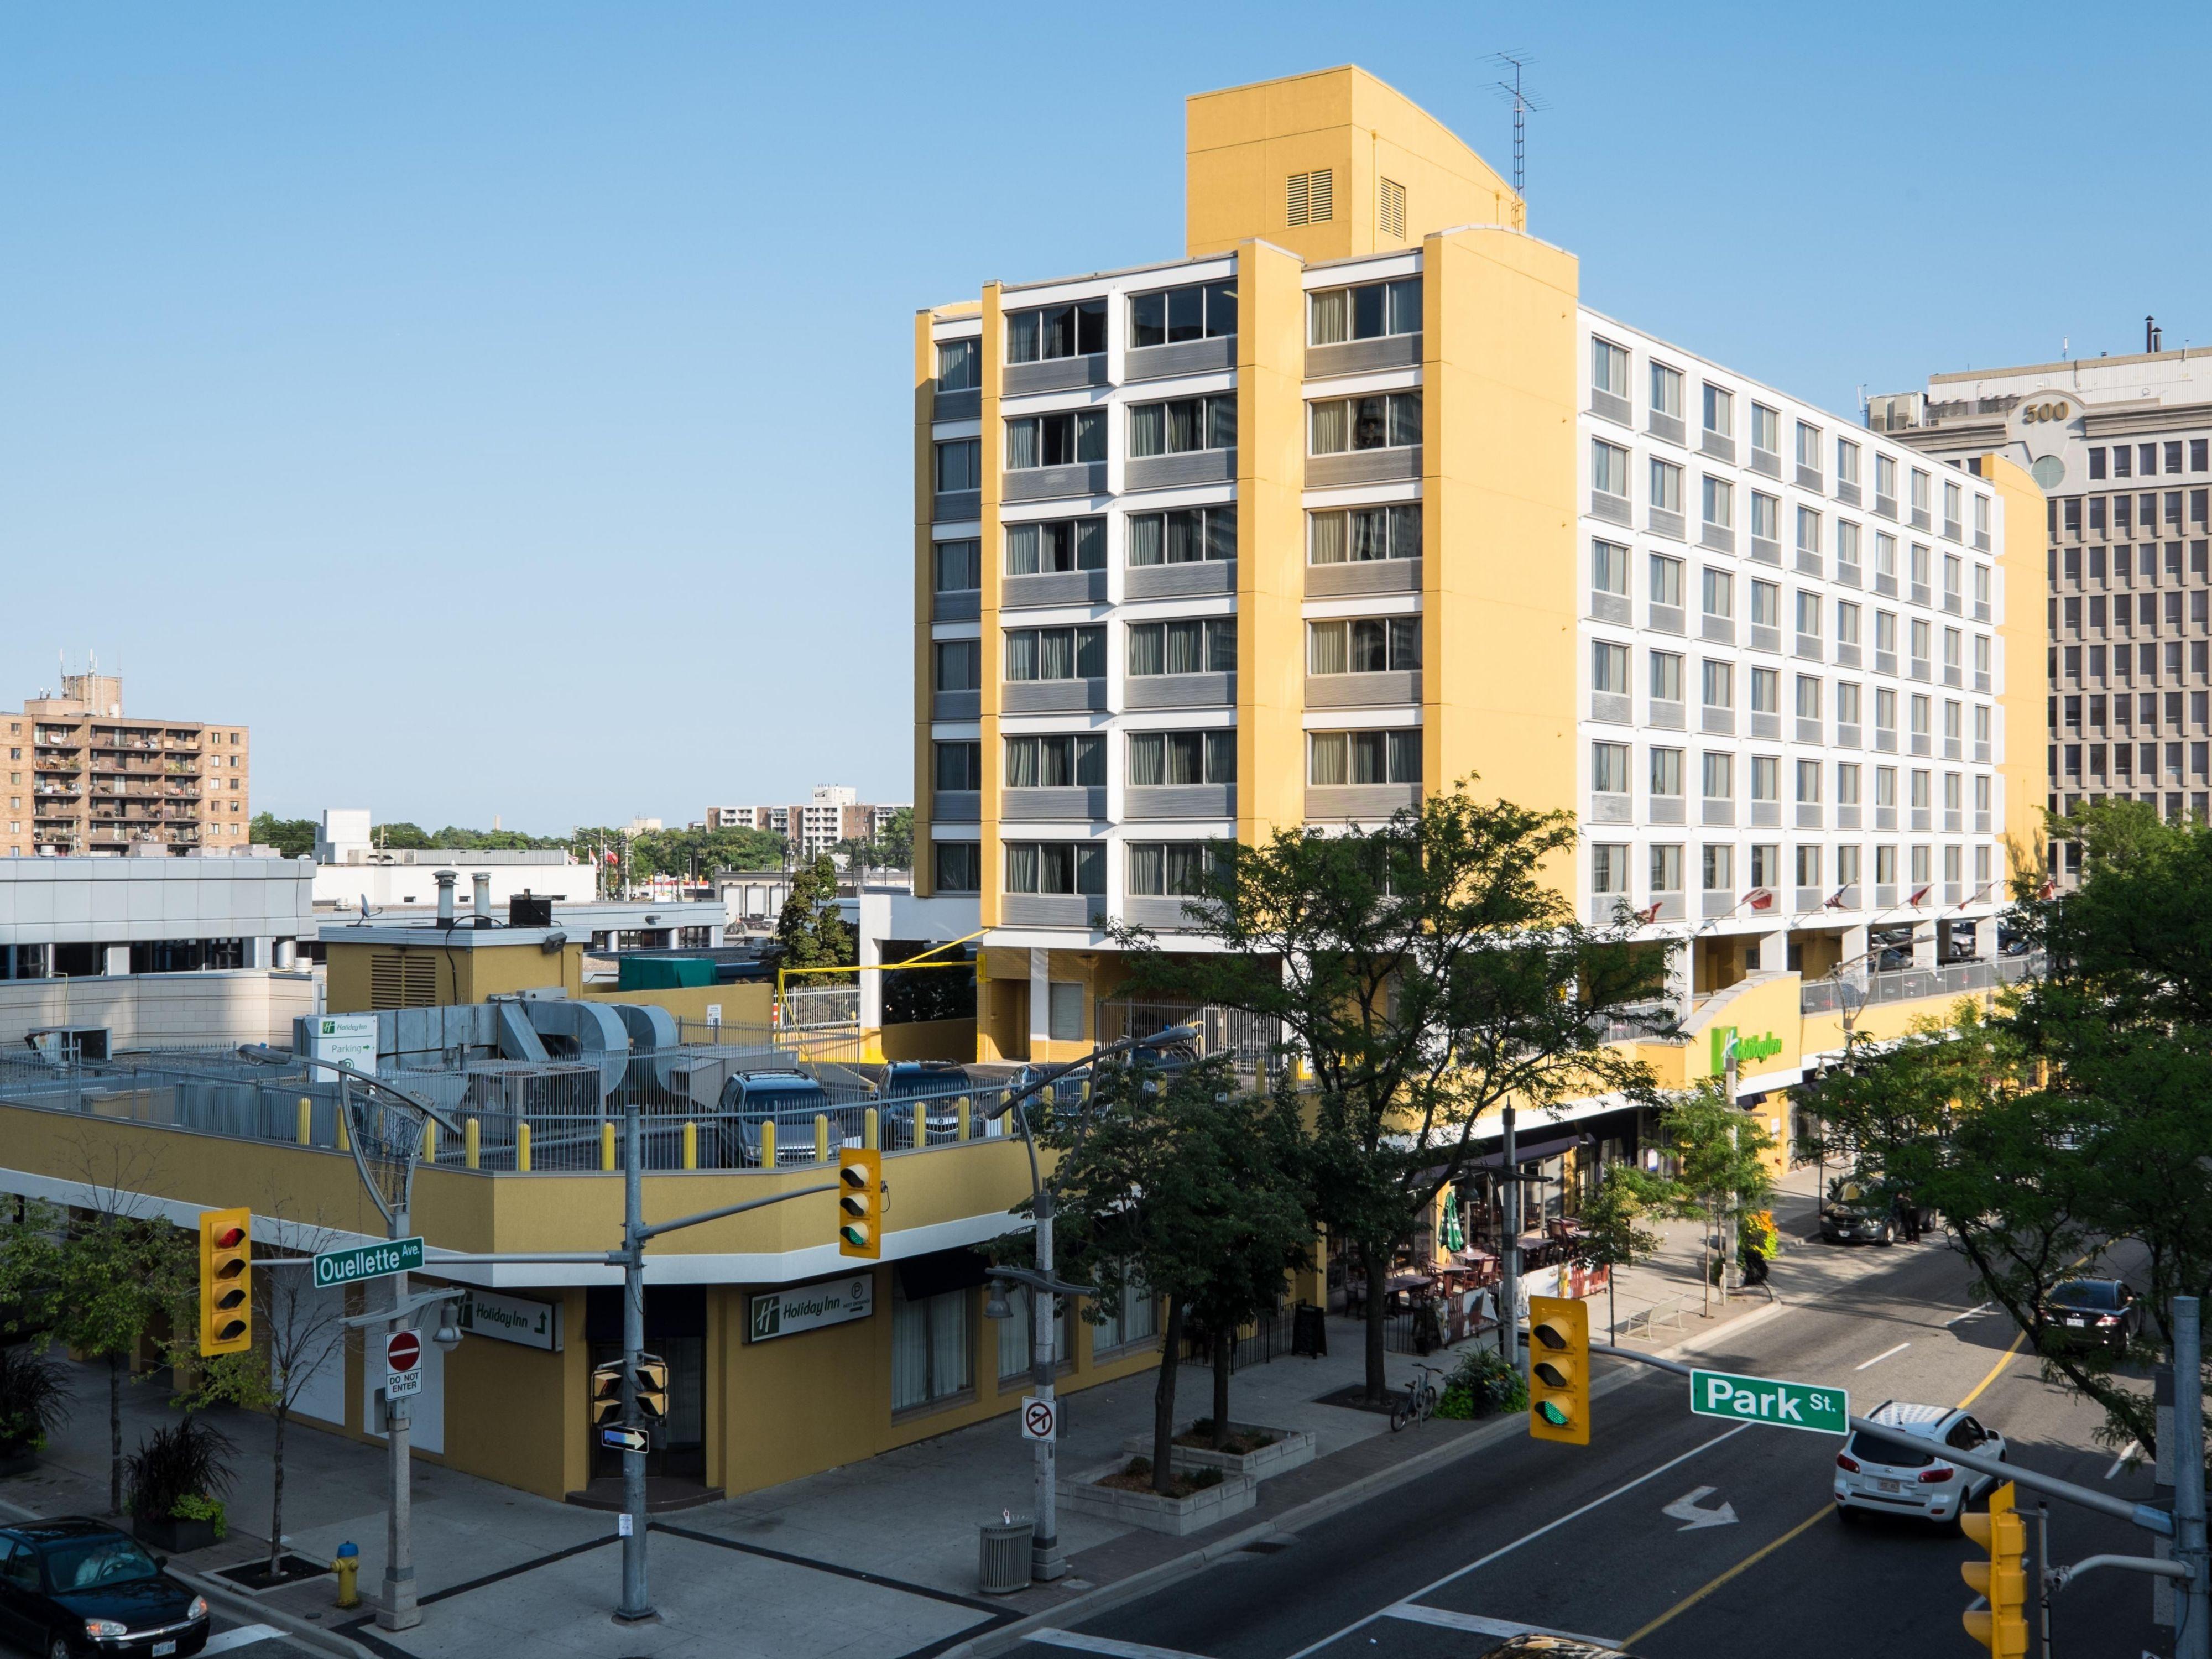 Holiday Inn Hotel Windsor